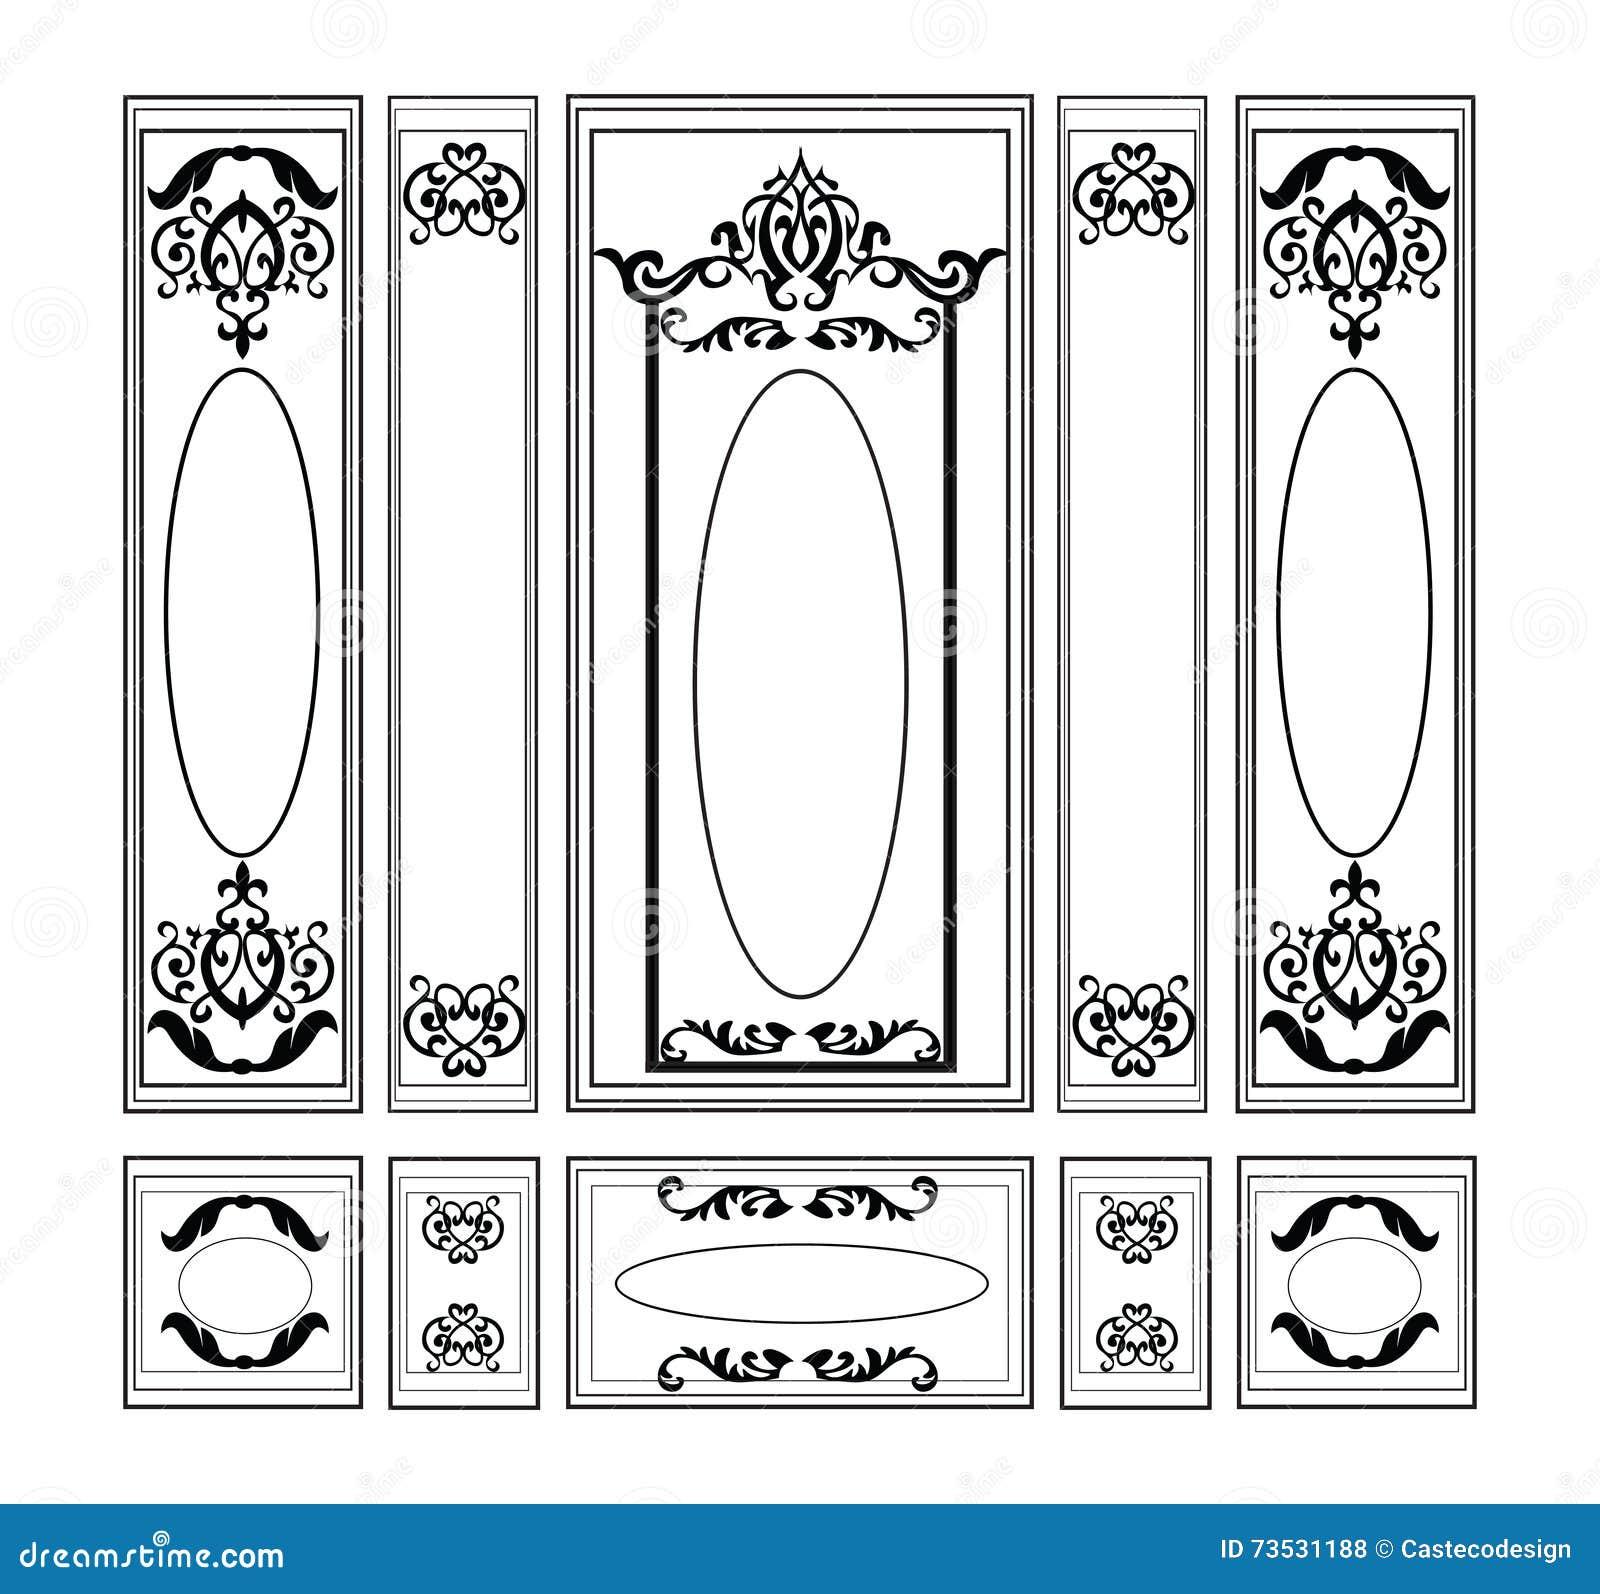 Vector wainscoting decorative damask ornamented frames for walls vector wainscoting decorative damask ornamented frames for walls or backgrounds jeuxipadfo Gallery